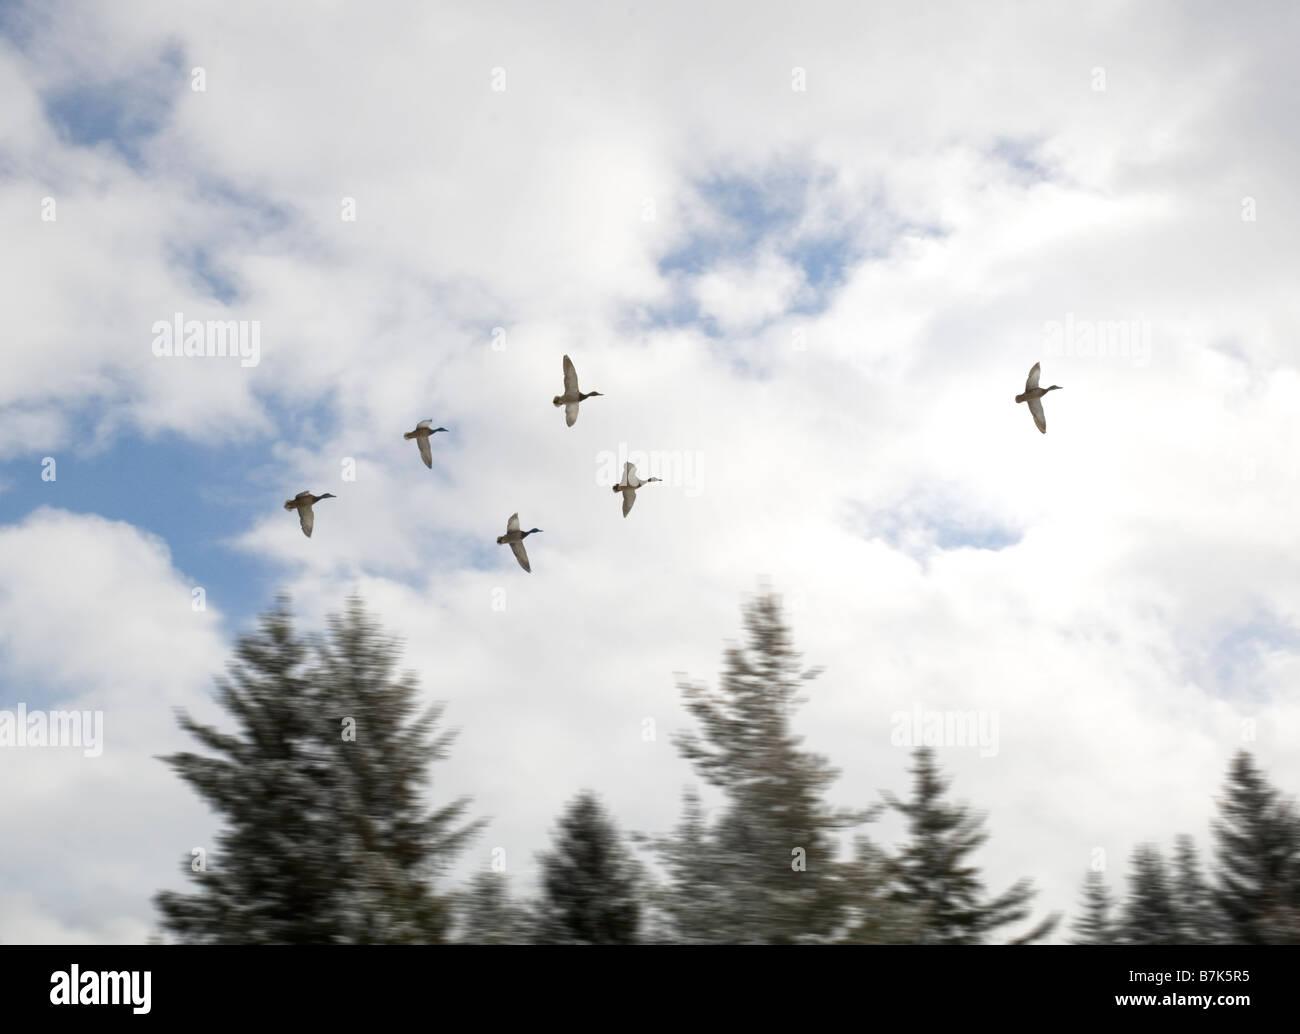 Ducks in flight, Whistler, BC Canada - Stock Image